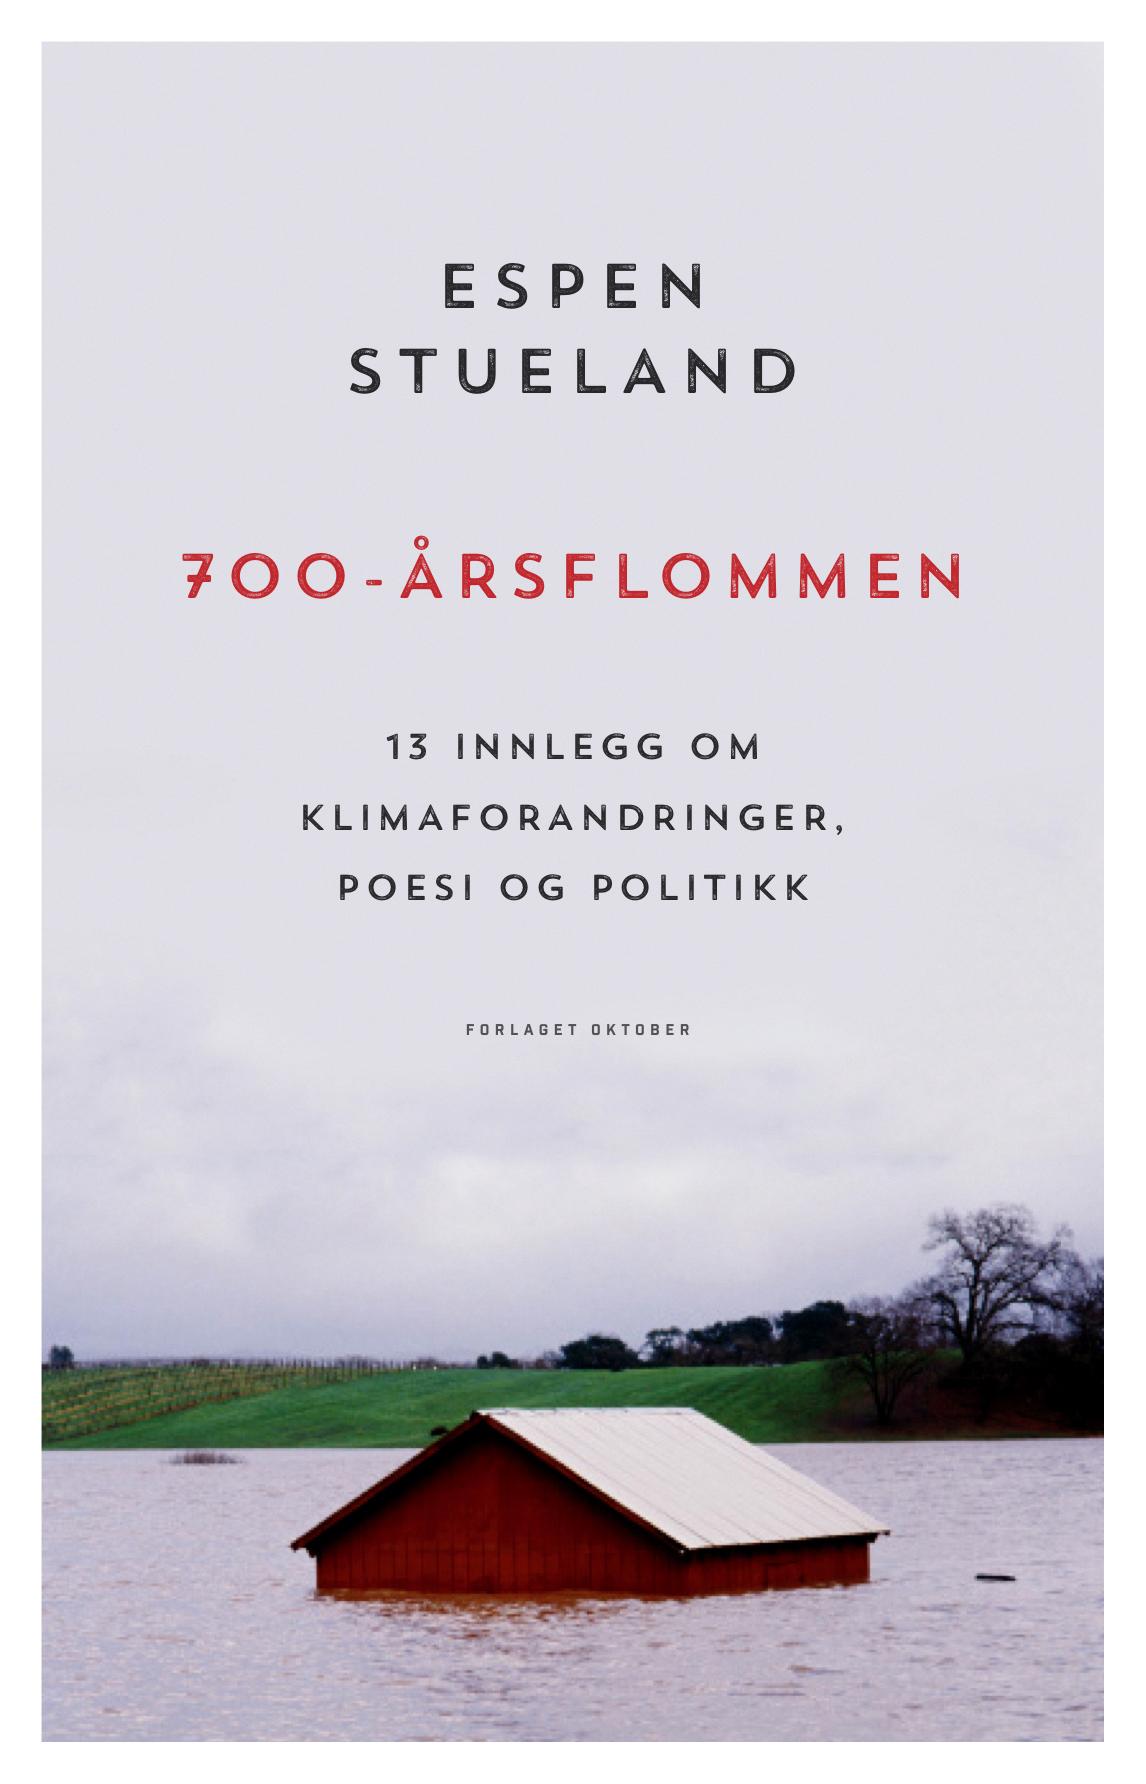 Espen Stueland, 700-årsflommen, Oktober forlag, 2016